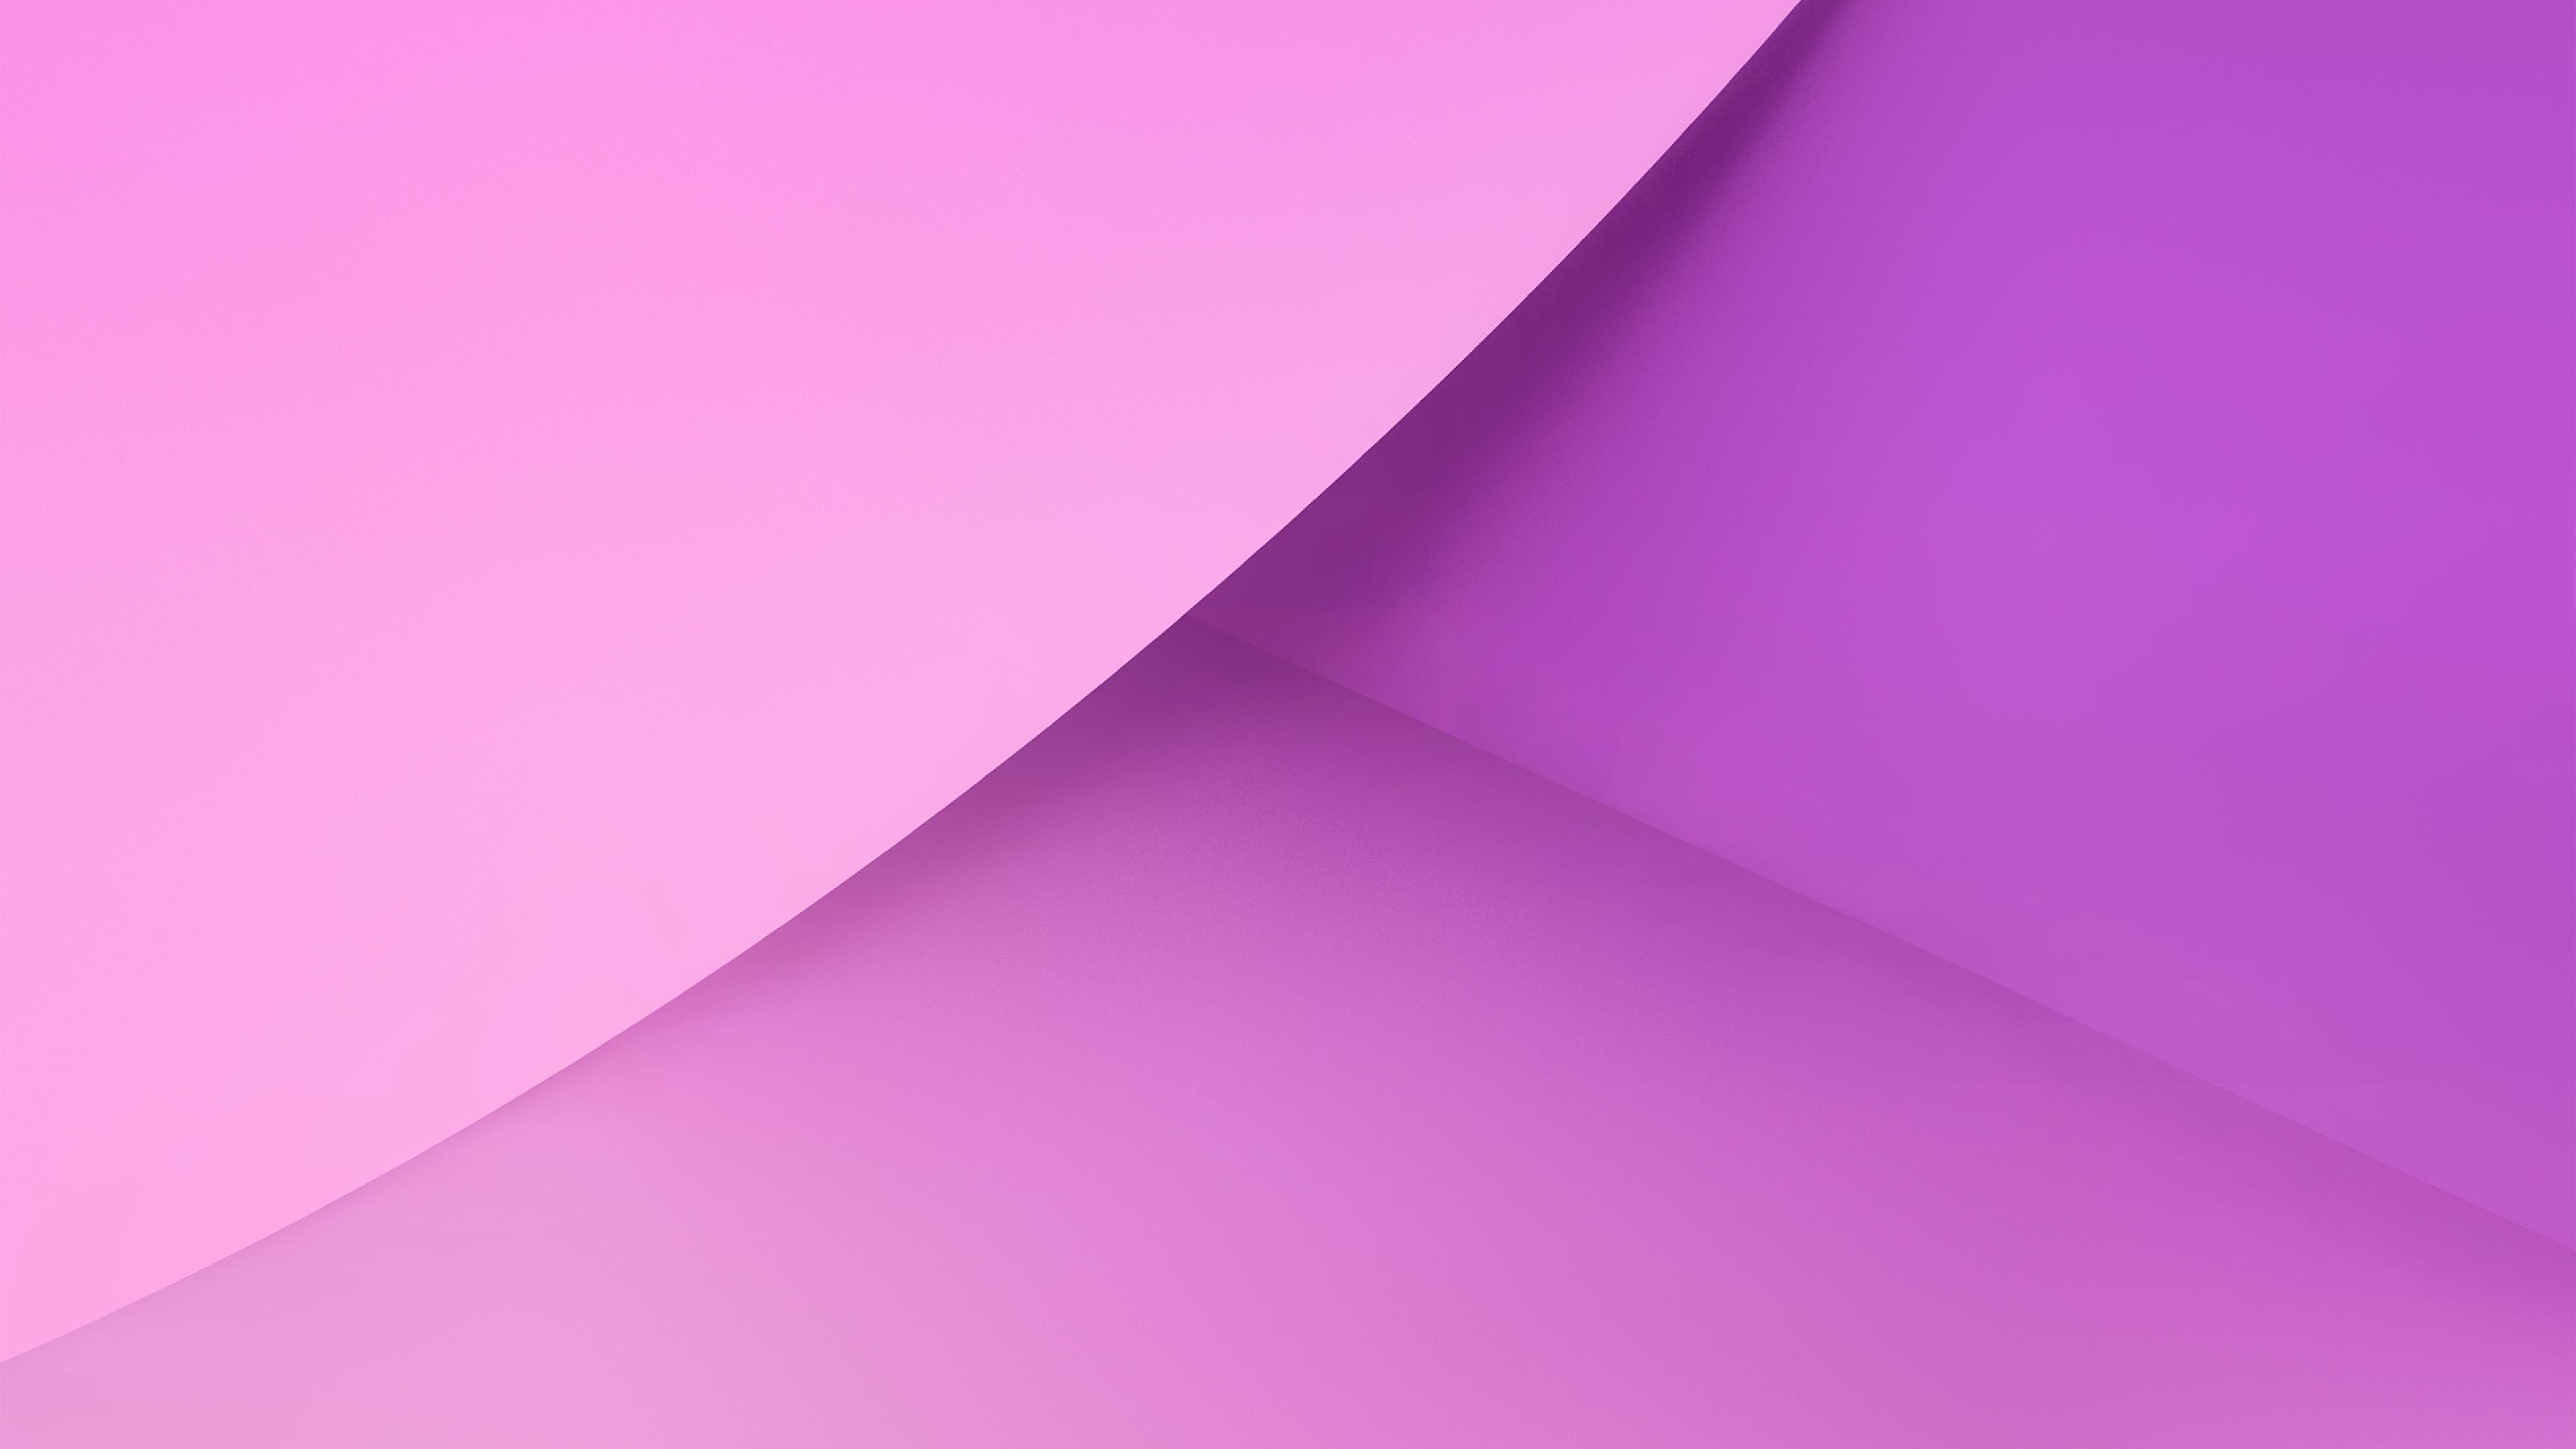 Vq83 Note 7 Purple Galaxy Circle Abstract Pattern Wallpaper